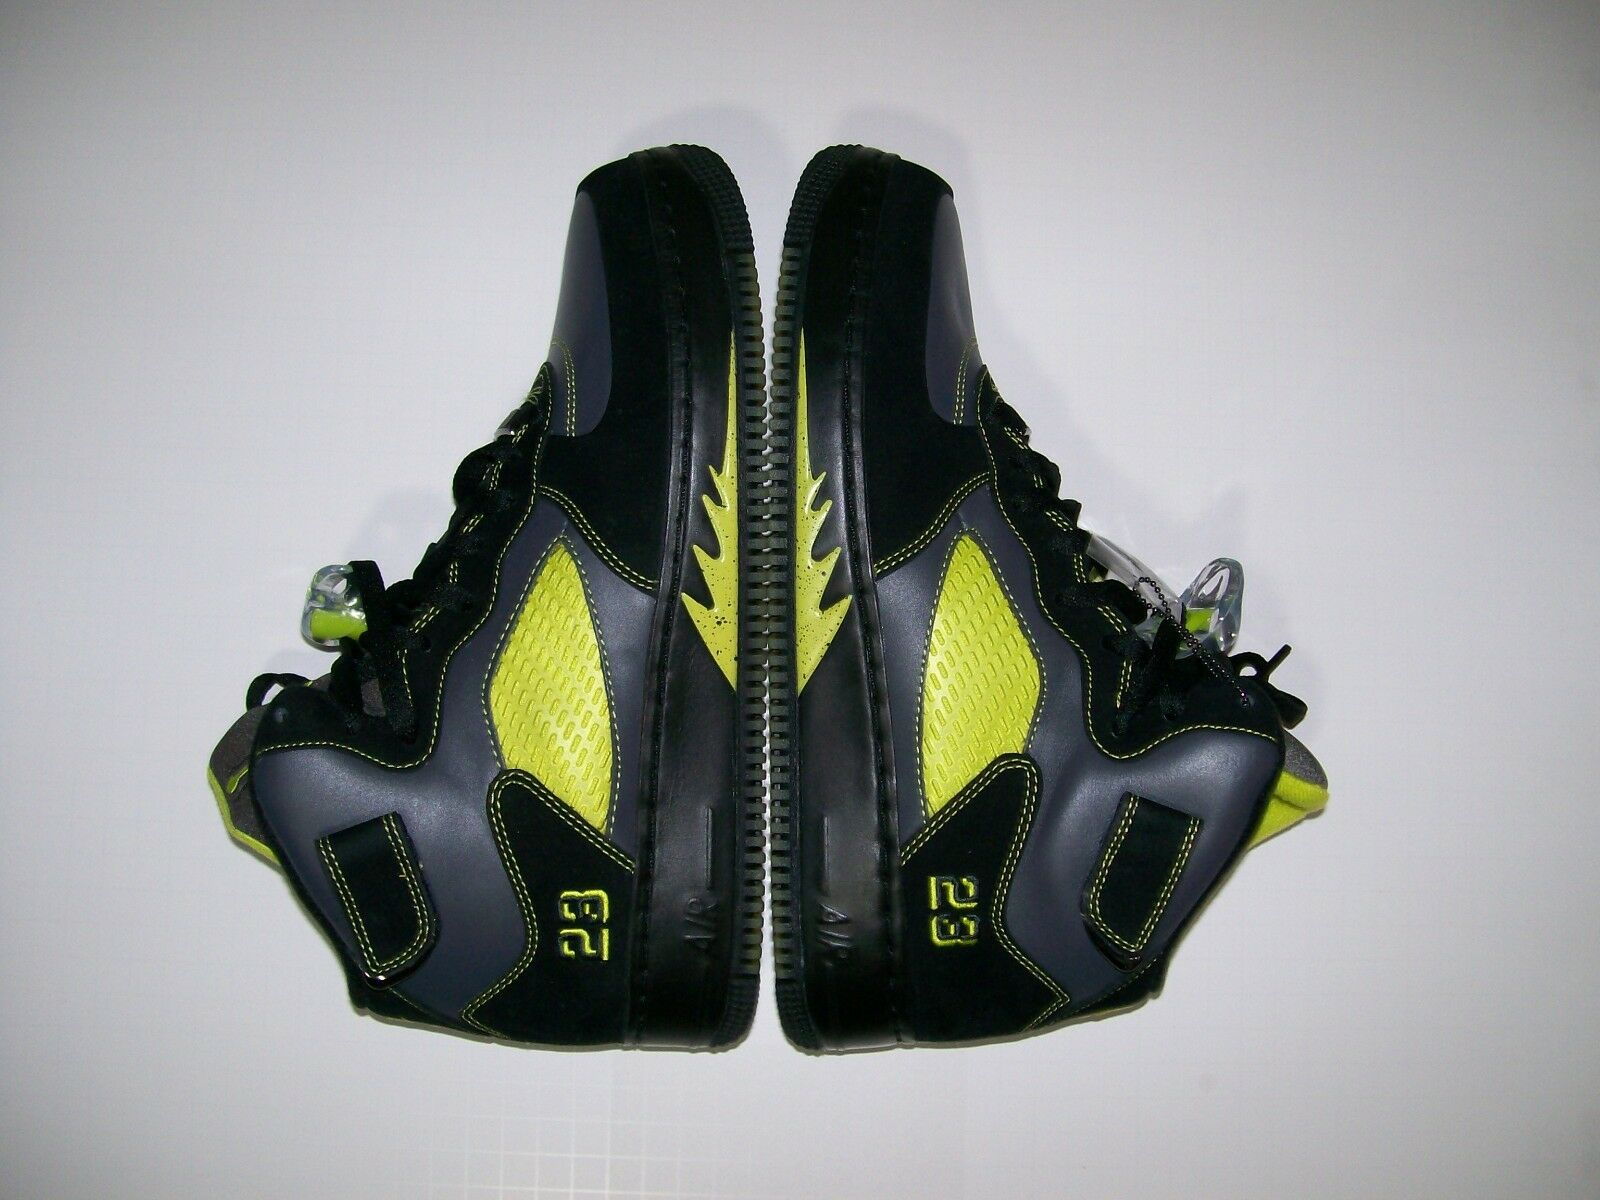 NEW SZ 11 Nike Air Jordan Fusion 5 AJF5 LS 322882-031 Black Cactus V Force 1 X